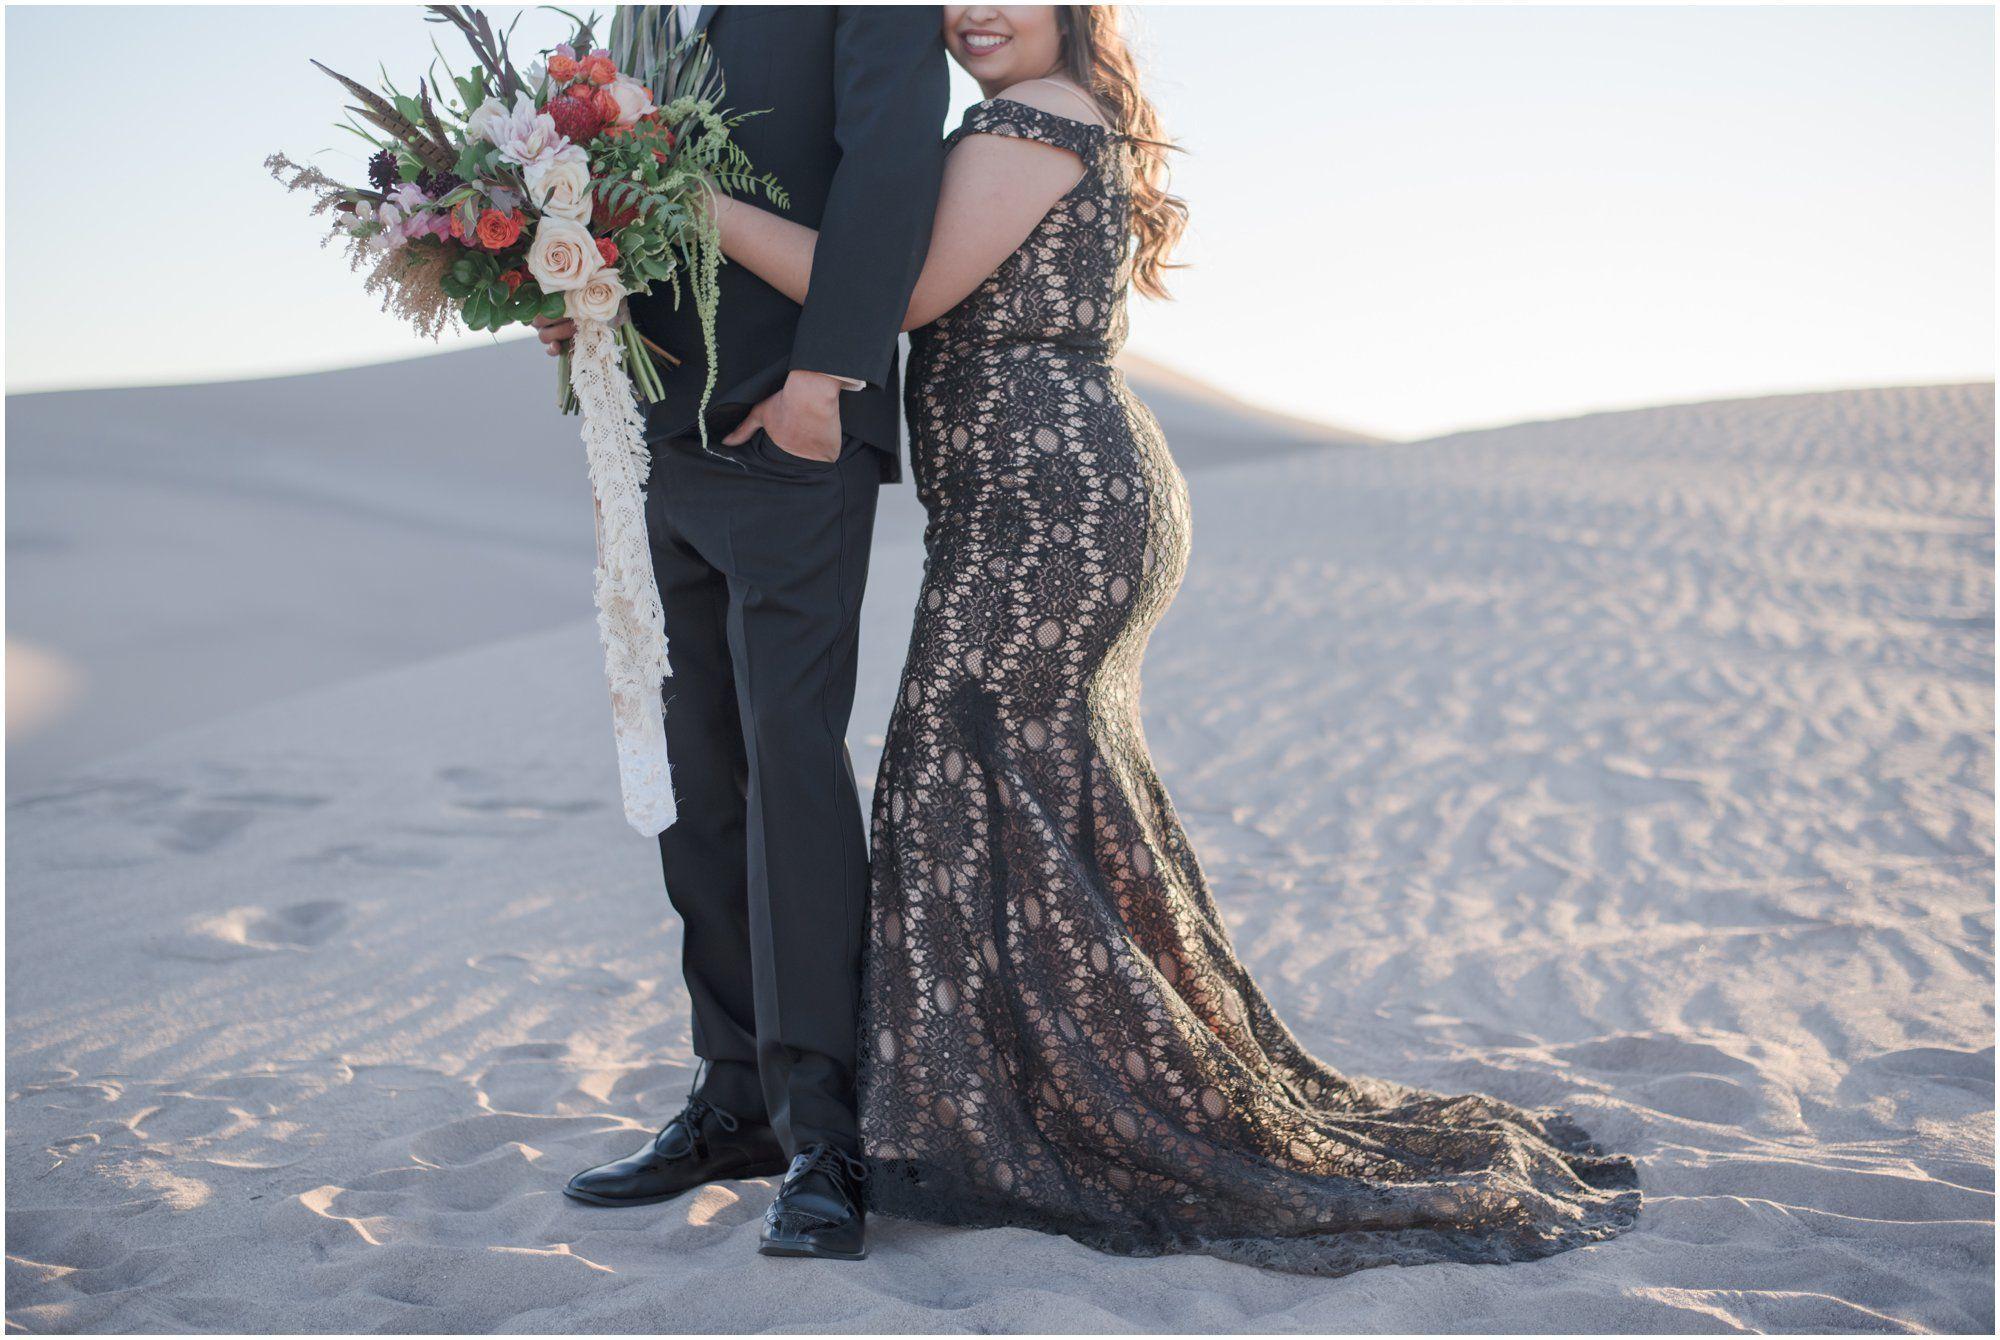 Armagosa Valley Sand Dunes, Las Vegas Nevada // Las Vegas Nevada Engagement Idea…